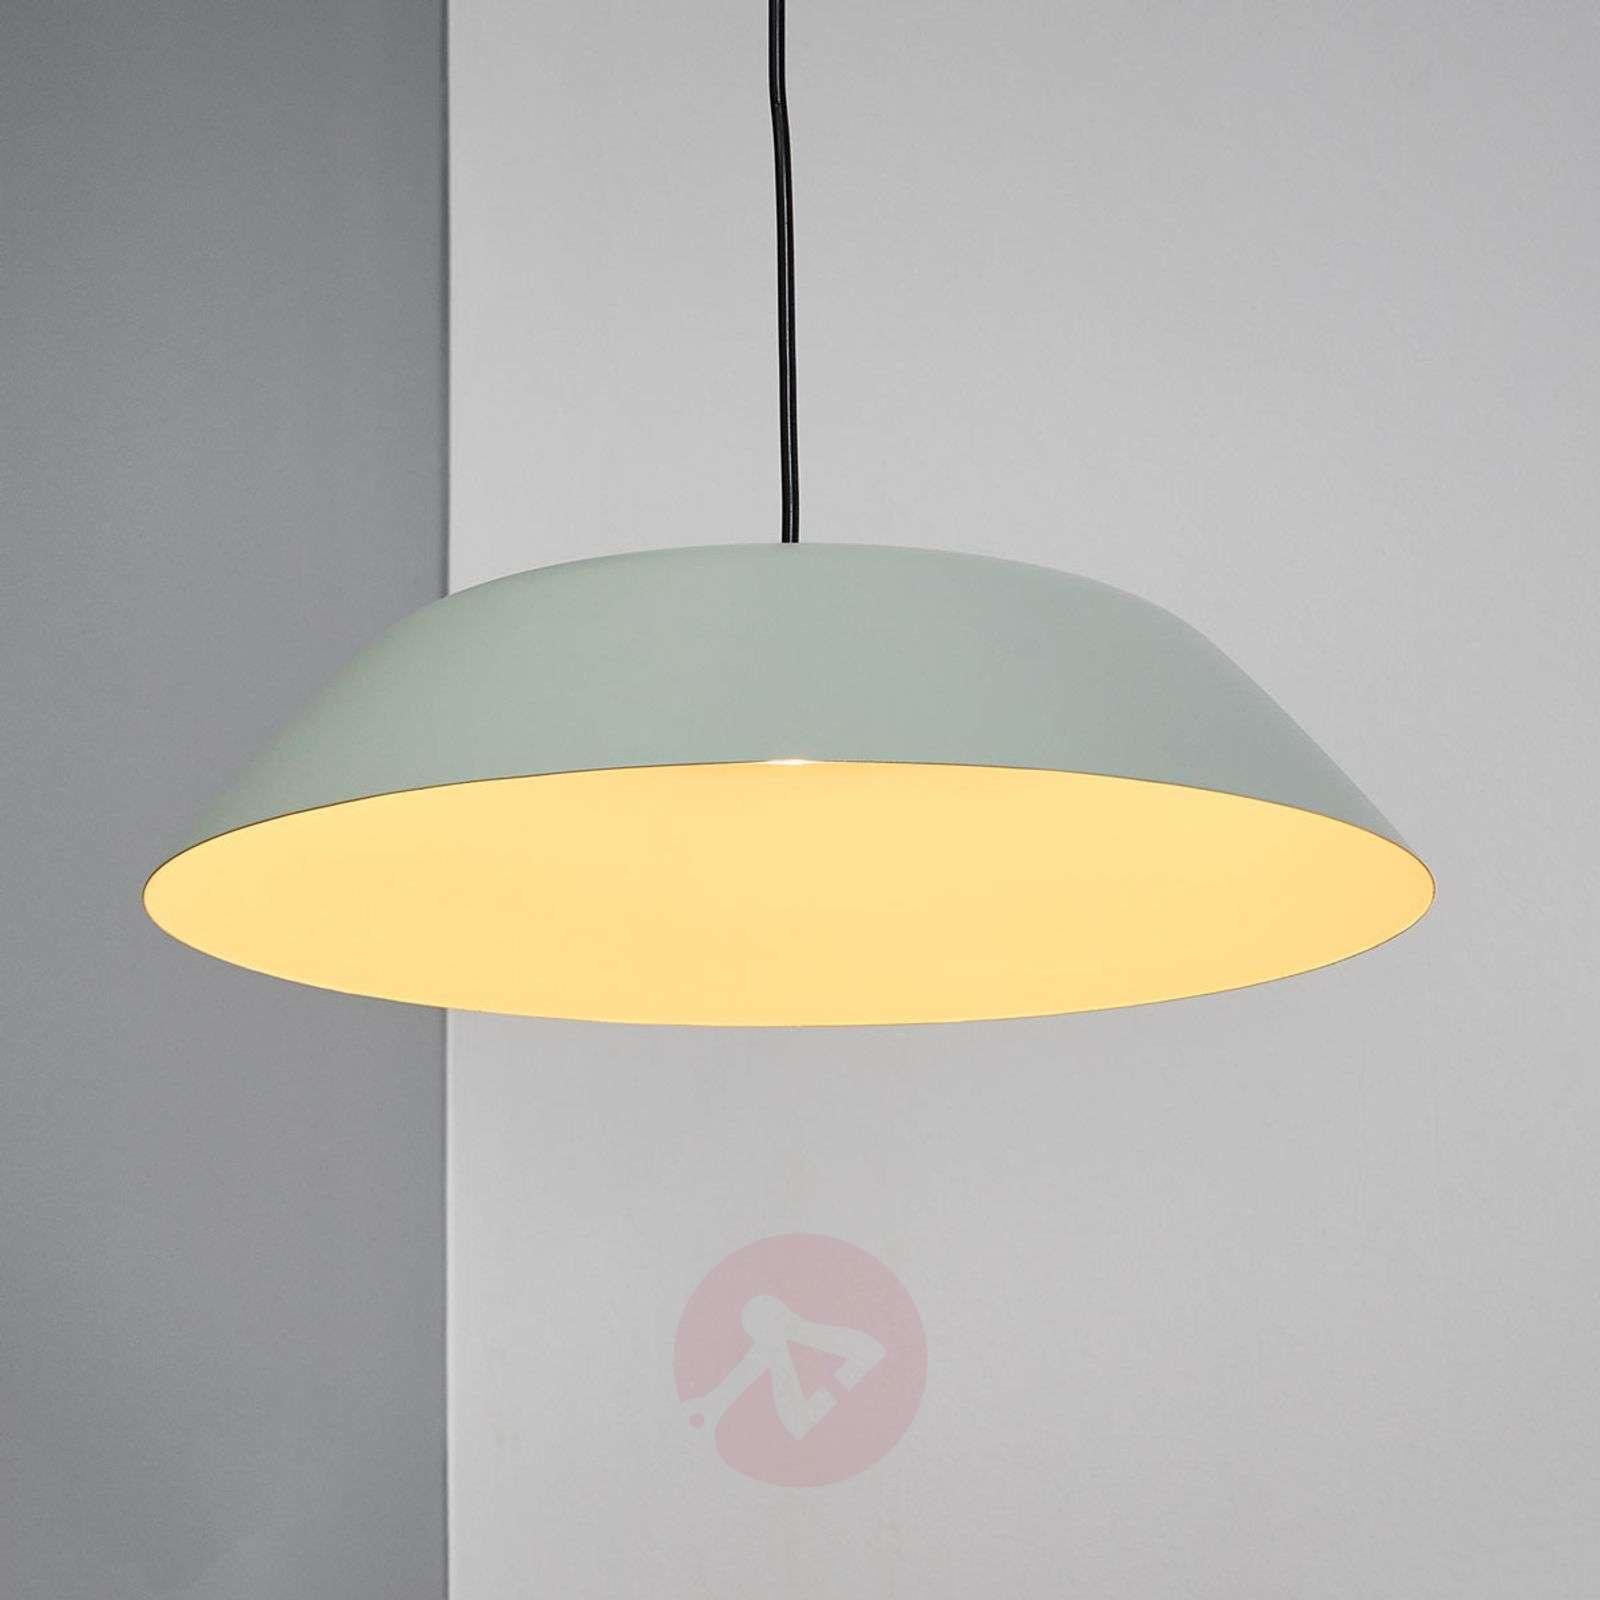 Green Fado LED hanging light-7531651-013